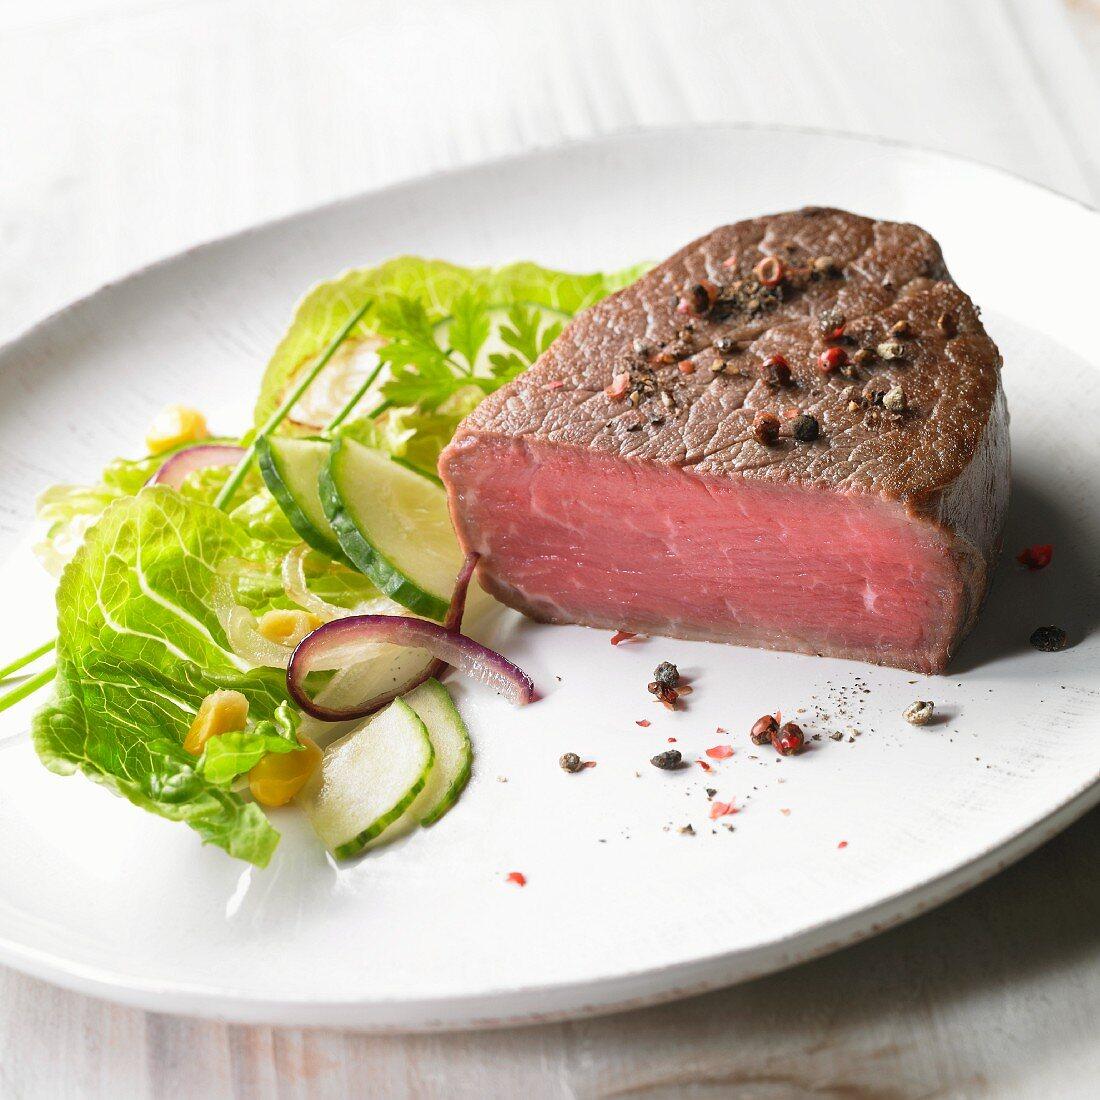 Medium rare pepper steak with a side salad